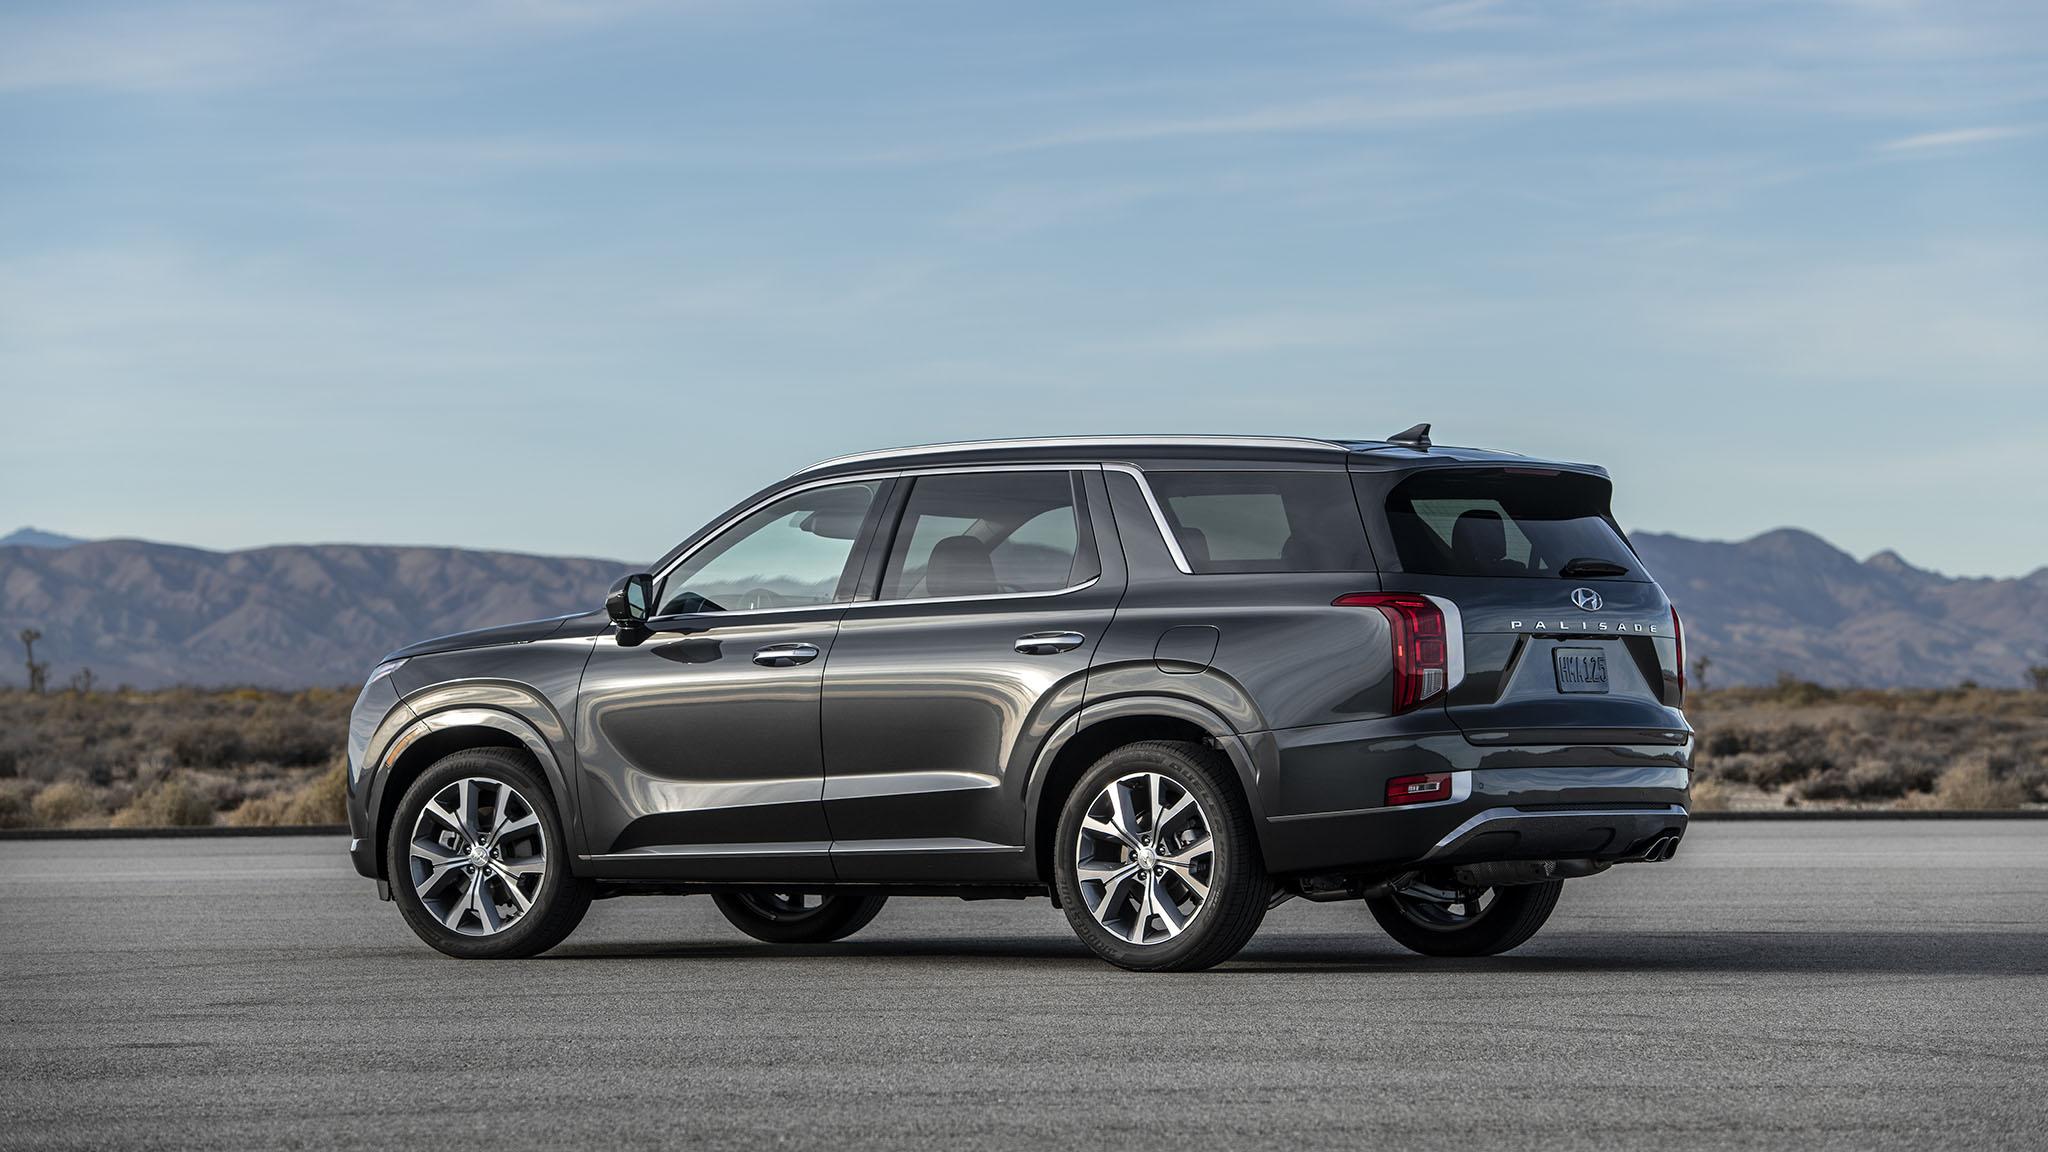 2020 Hyundai Palisade Is a Three-Row Flagship with Luxury ...